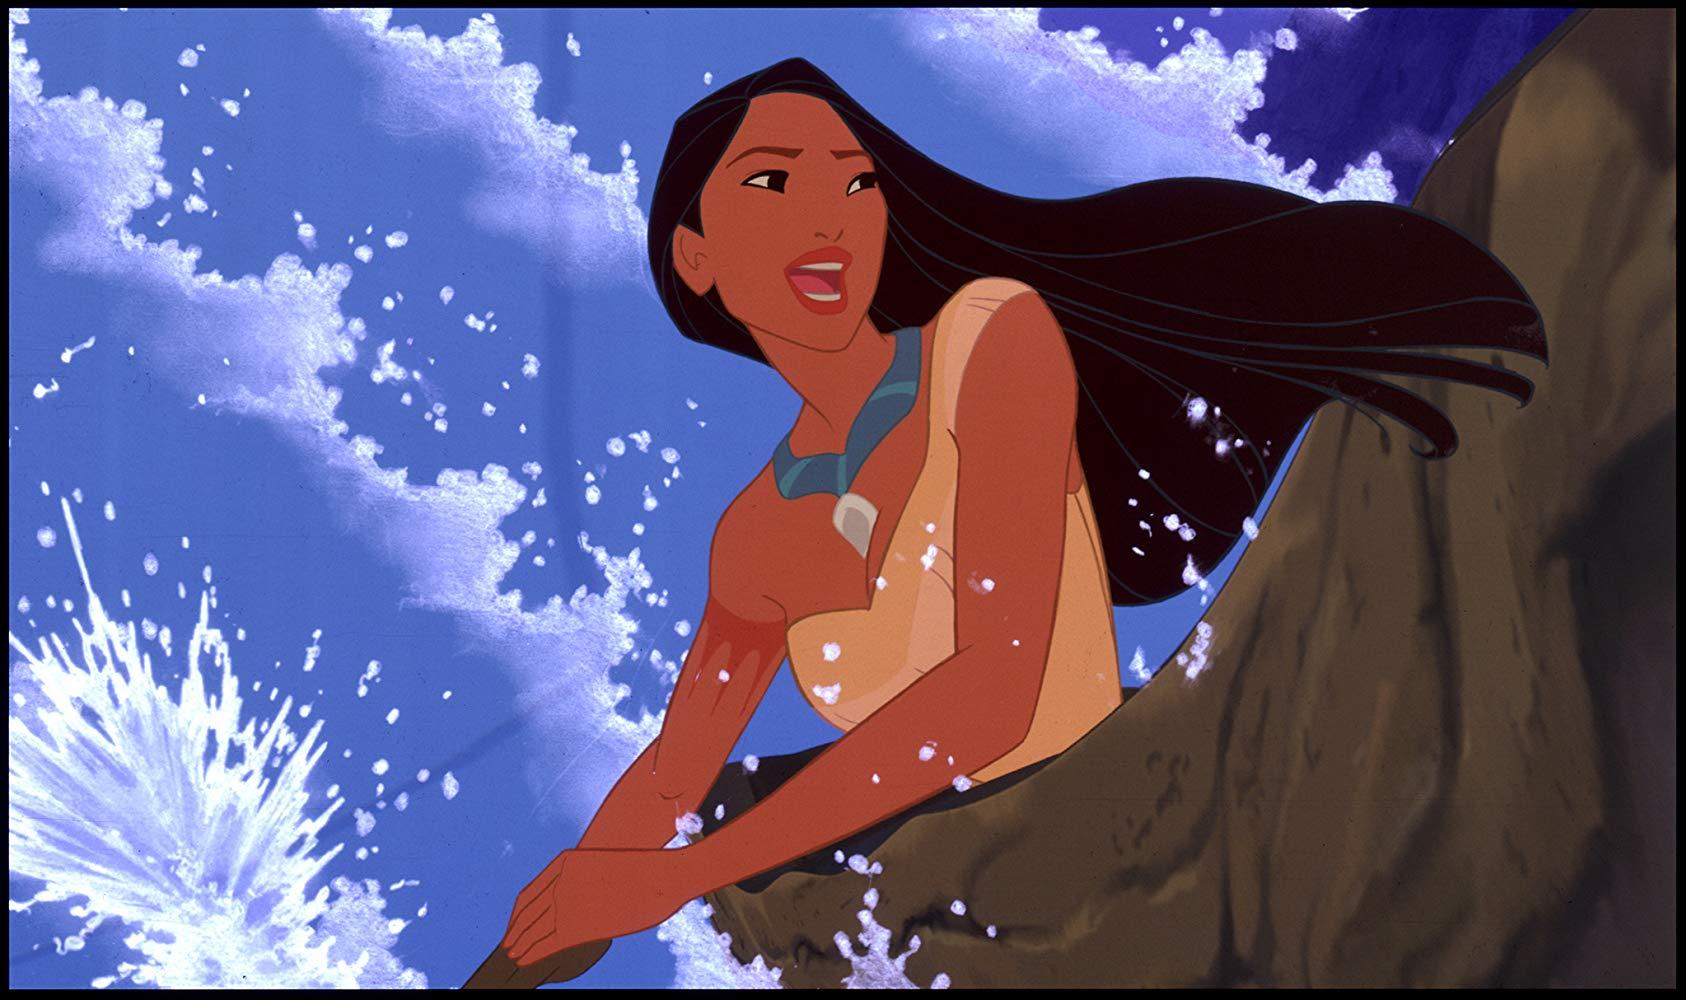 Pocahontas paddling a canoe.